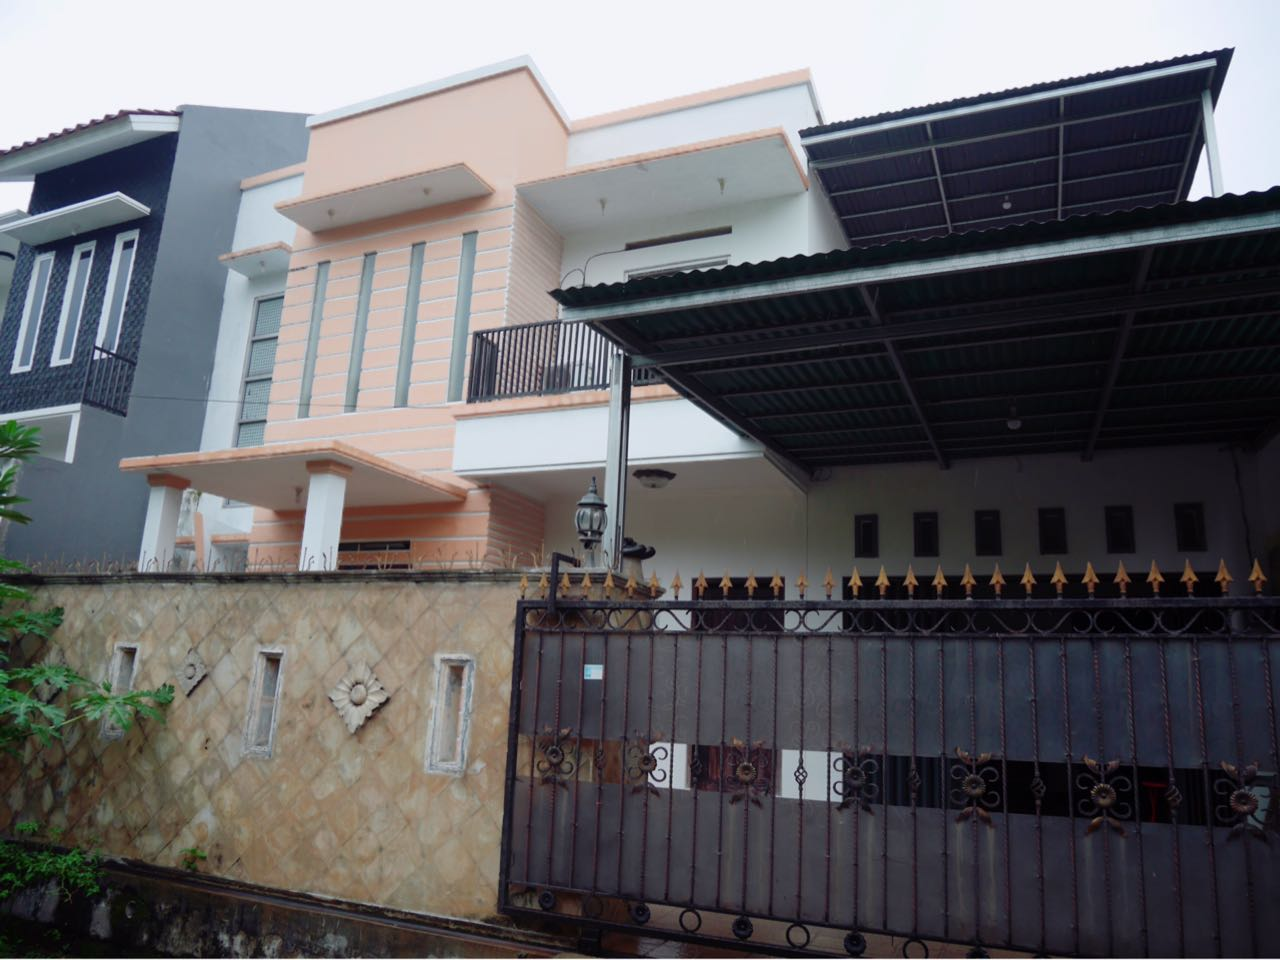 Rumah Nyaman dan Siap Huni di Kawasan Bukit Nusa Indah, Ciputat